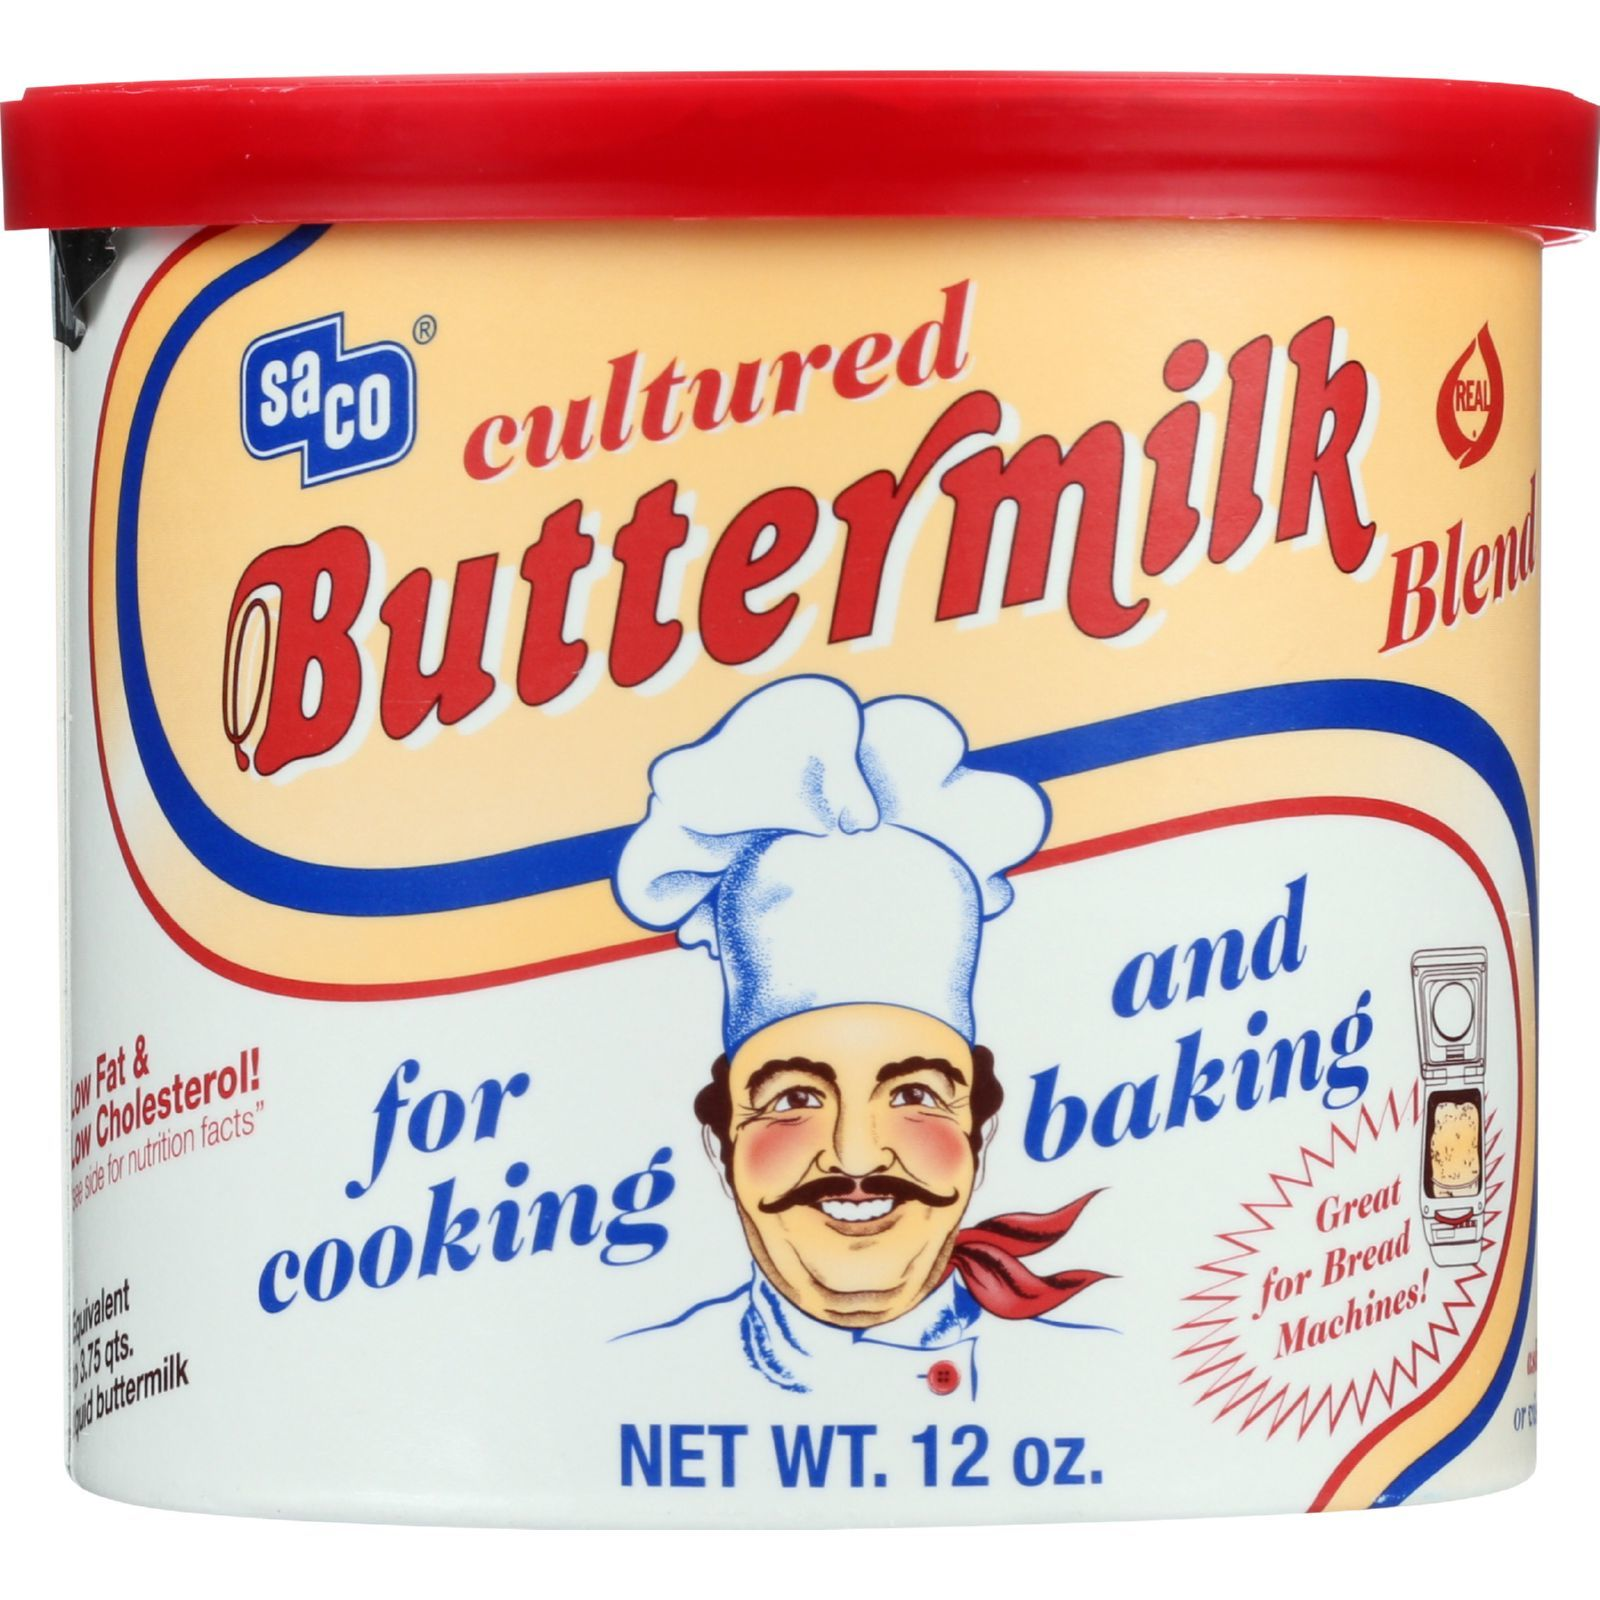 Saco Foods Buttermilk Powder Blend - Cultured - 12 oz - 1 each